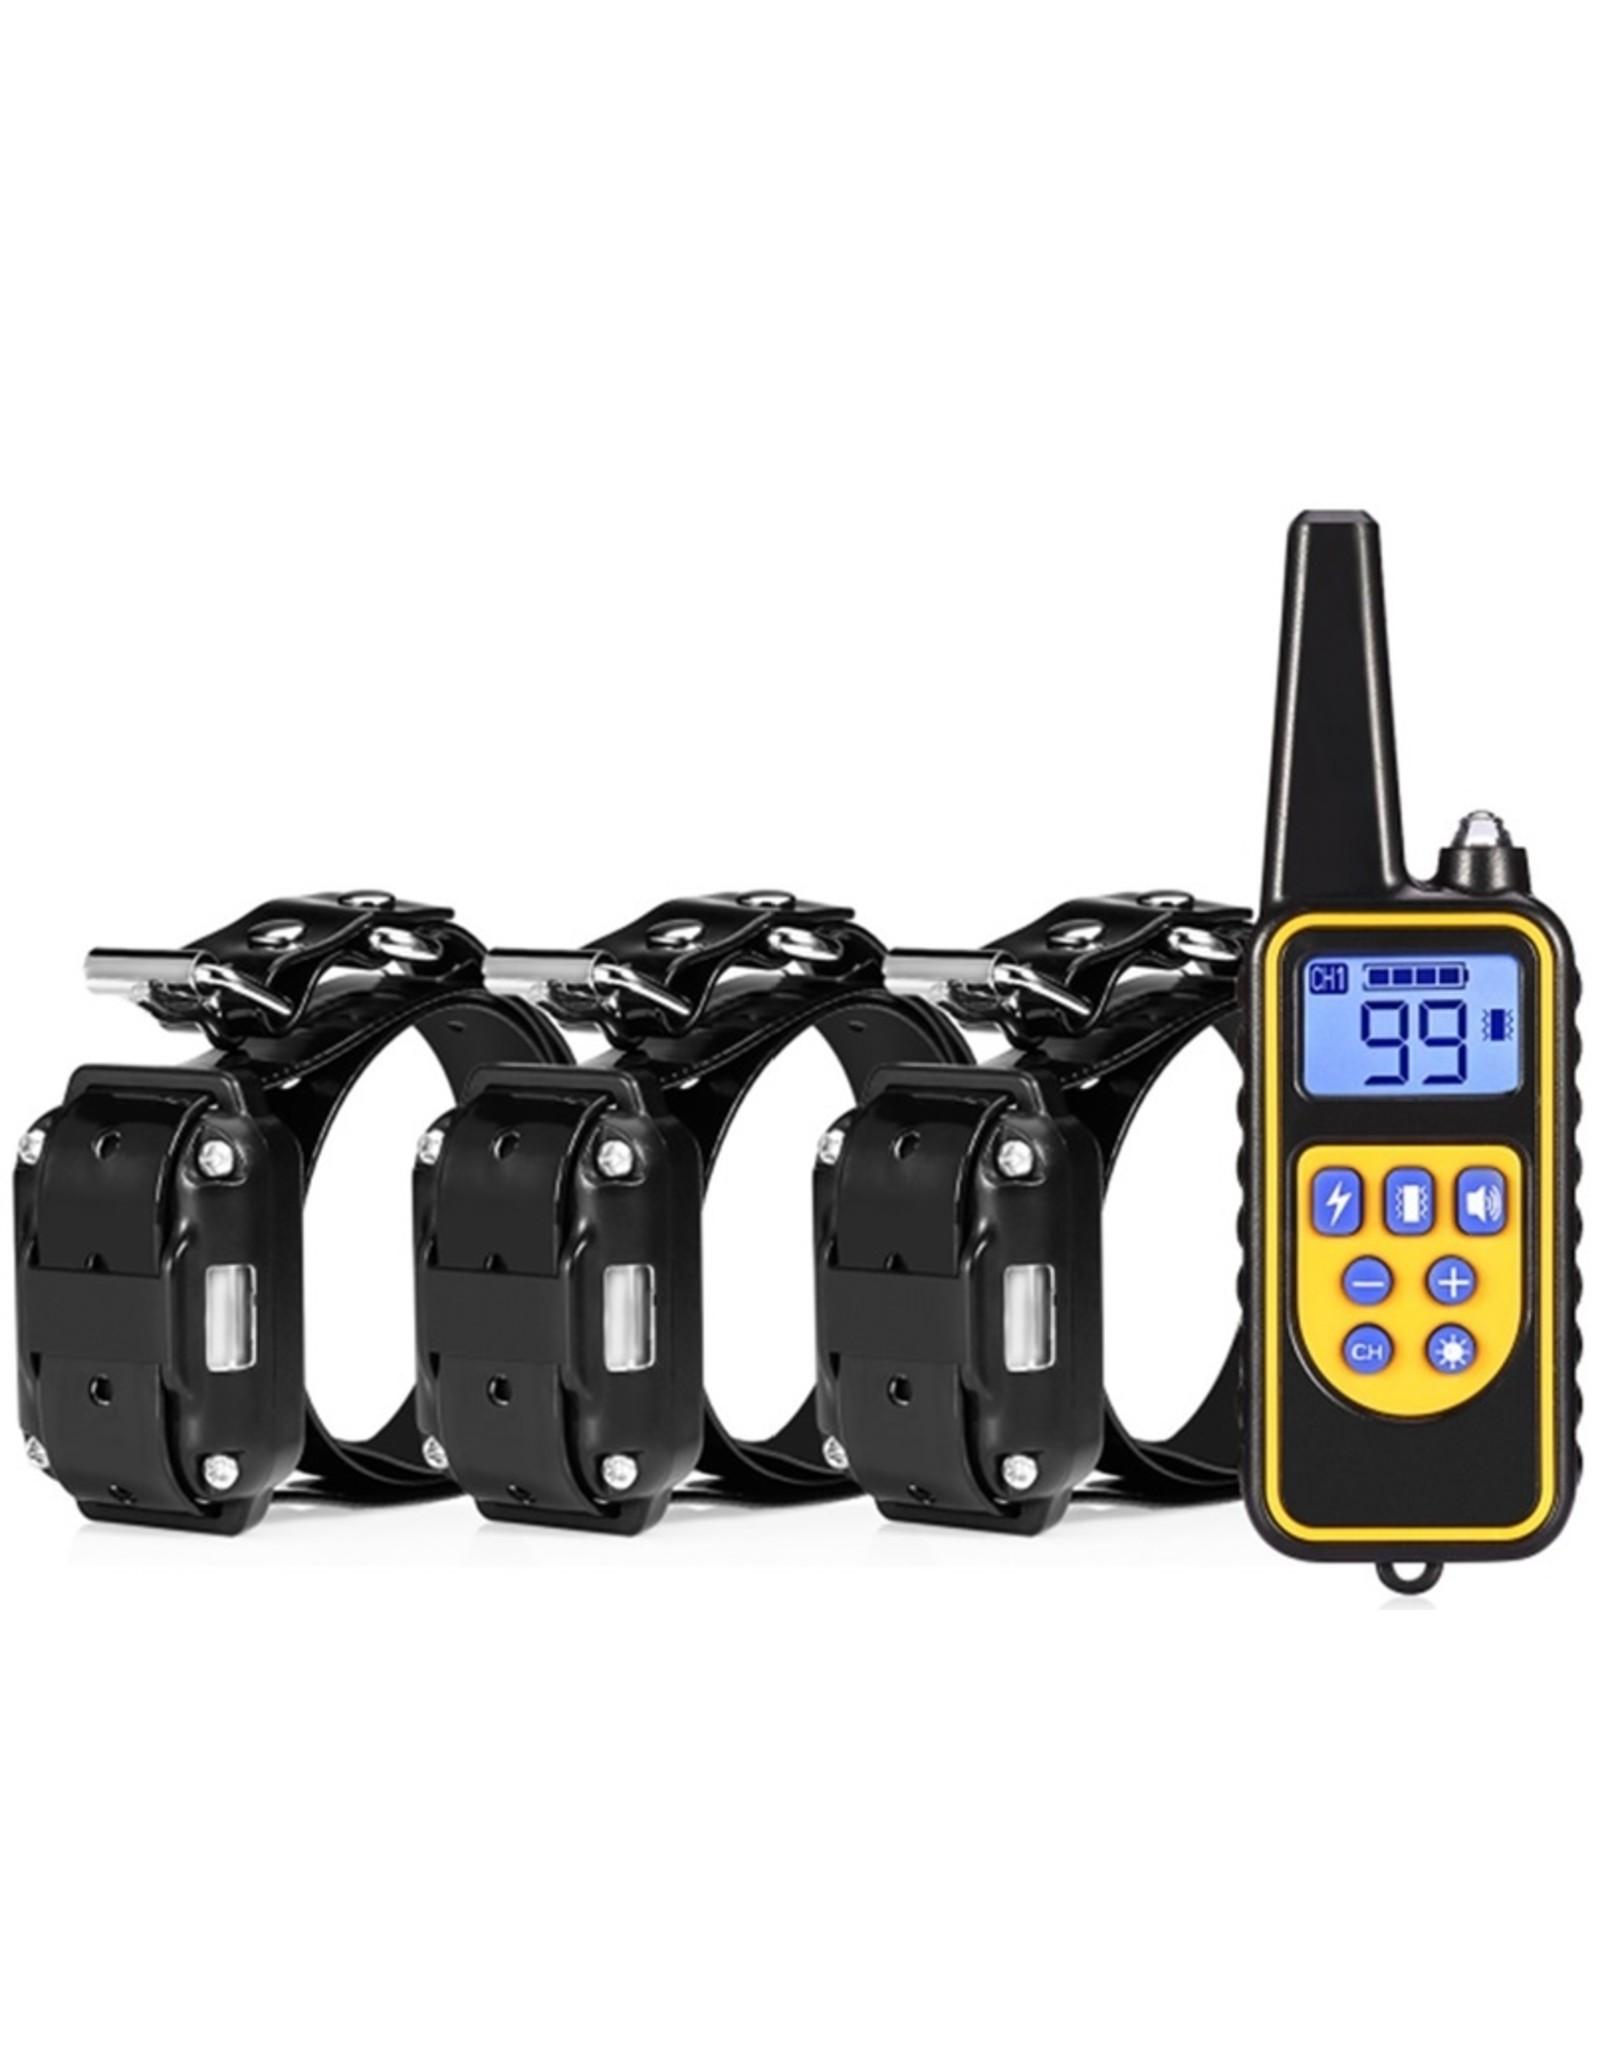 Trainingshalsband - trainingsband - teletac 800m oplaadbaar - Voor 3 honden